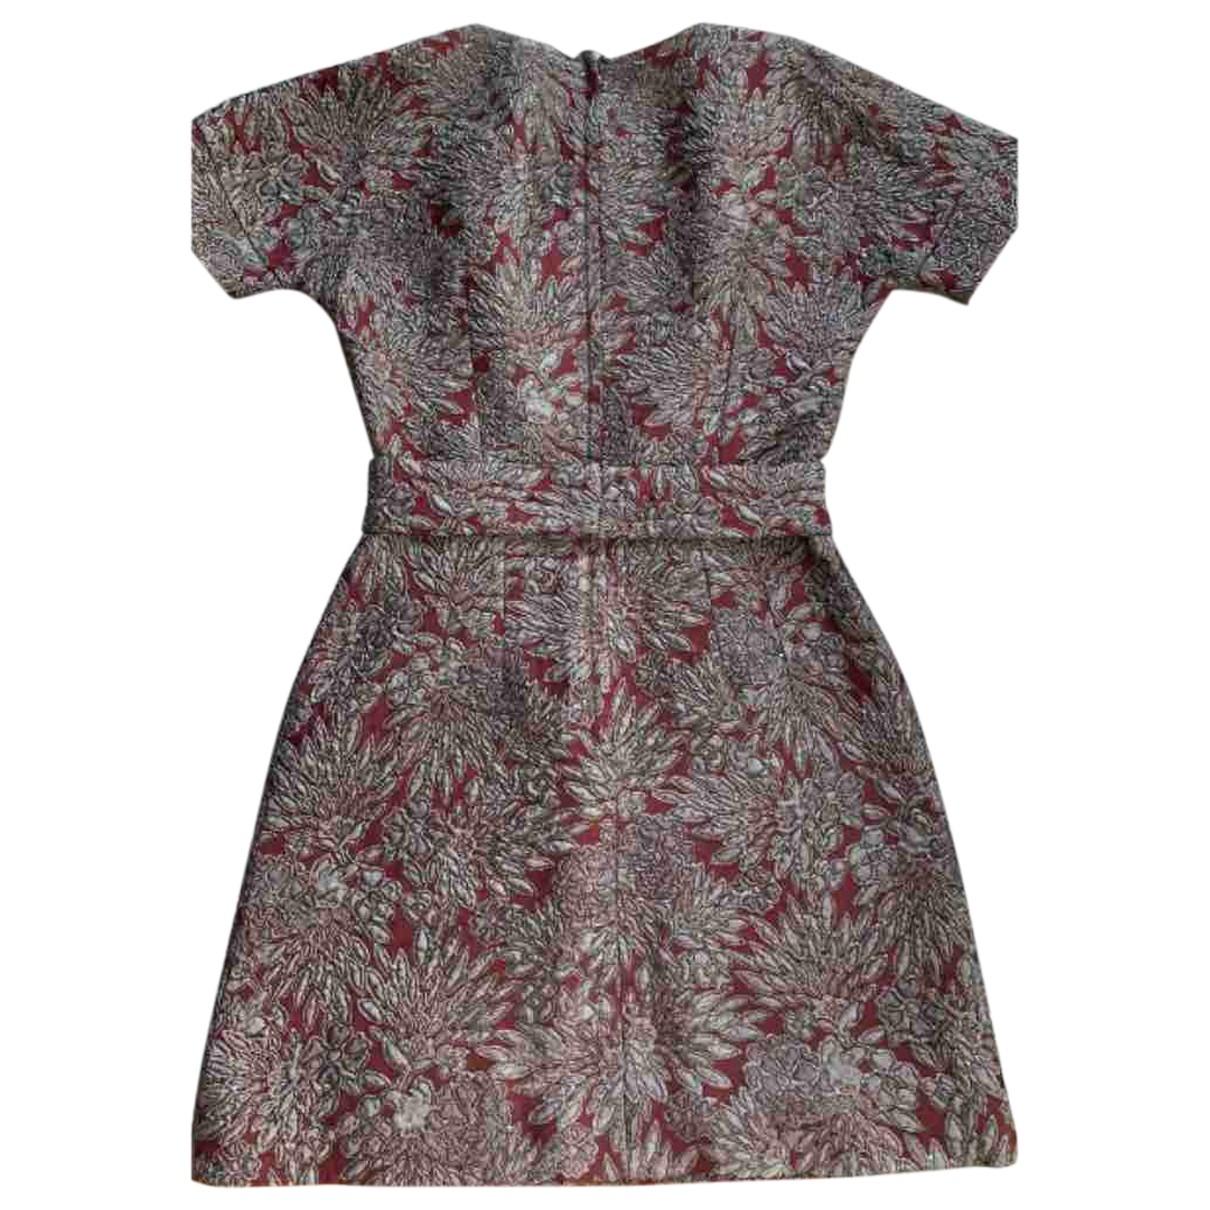 Dolce & Gabbana \N Burgundy dress for Women 42 IT